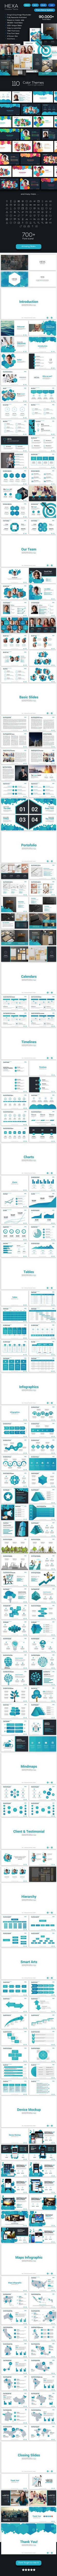 HEXA - Multipurpose Powerpoint Template. Download here: http://graphicriver.net/item/hexa-multipurpose-powerpoint-template/15799307?ref=ksioks